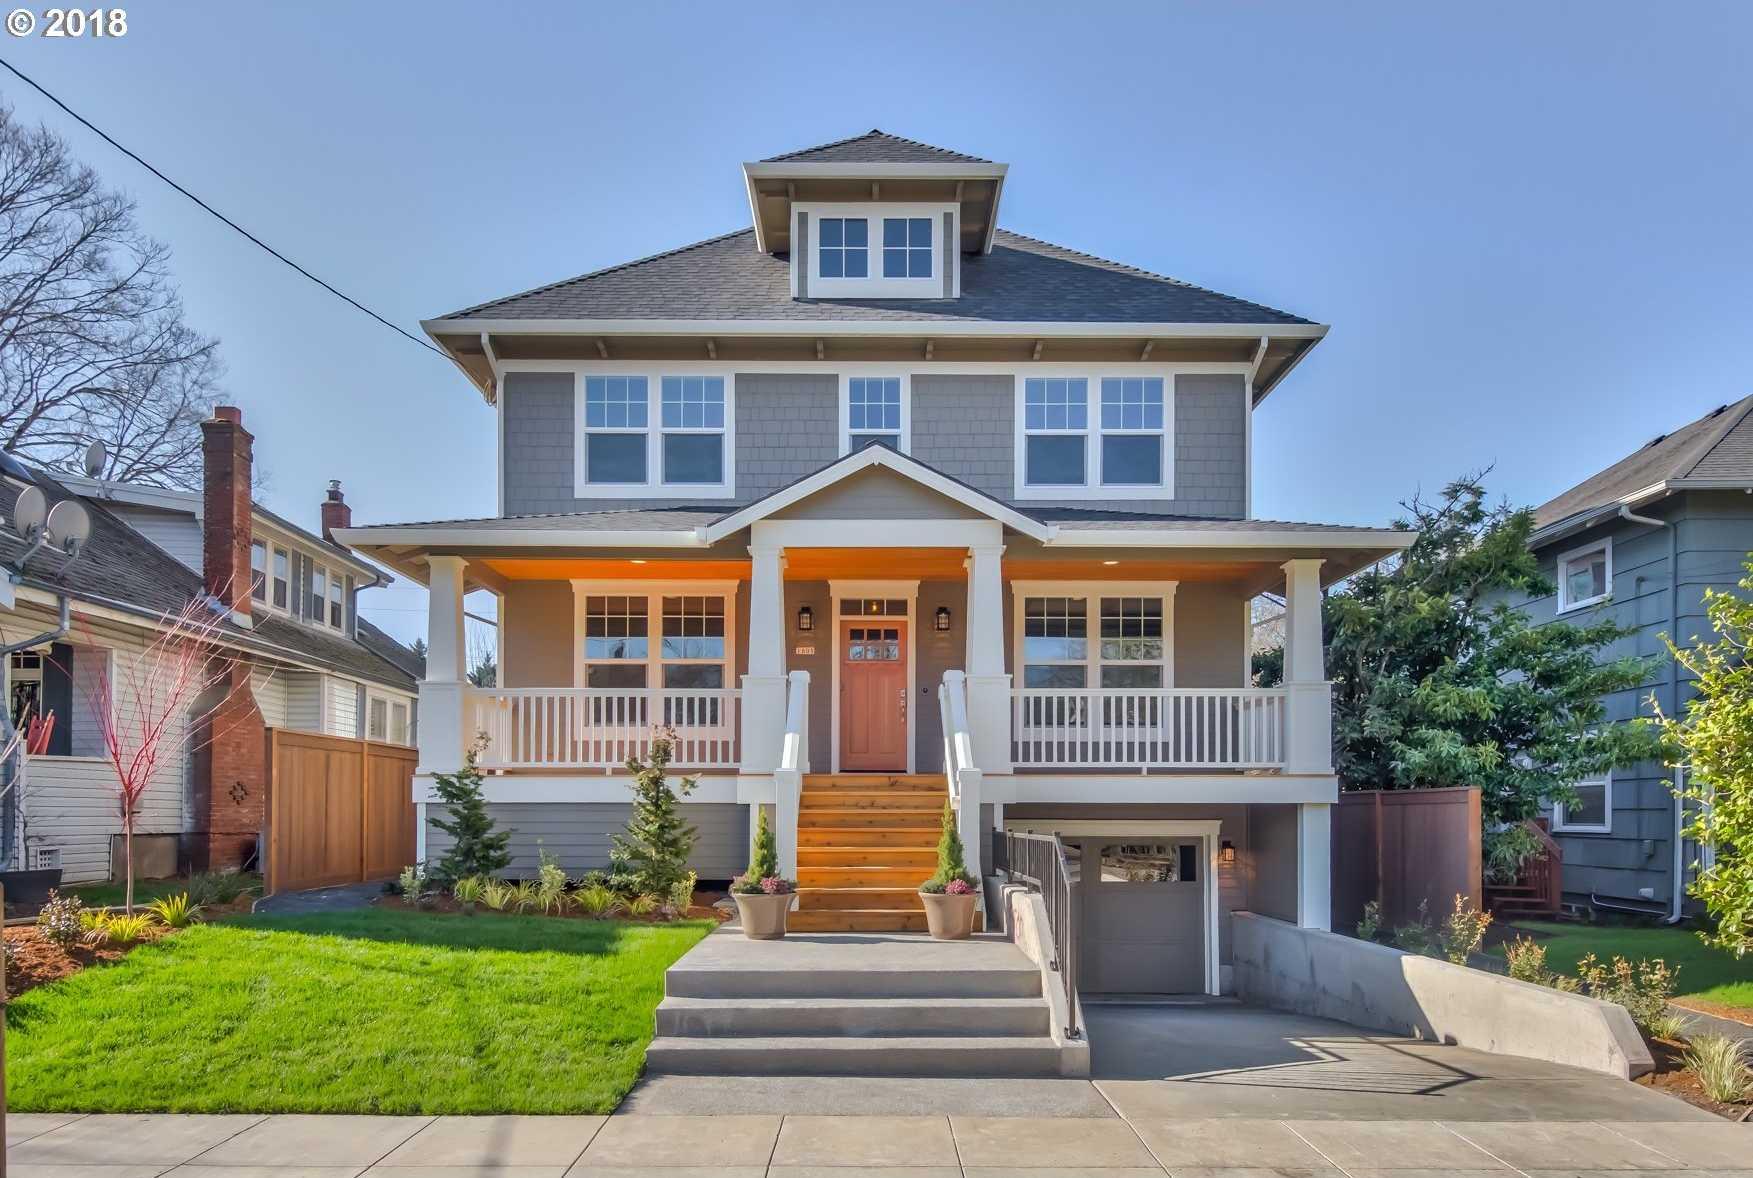 $999,900 - 4Br/3Ba -  for Sale in Richmond, Portland